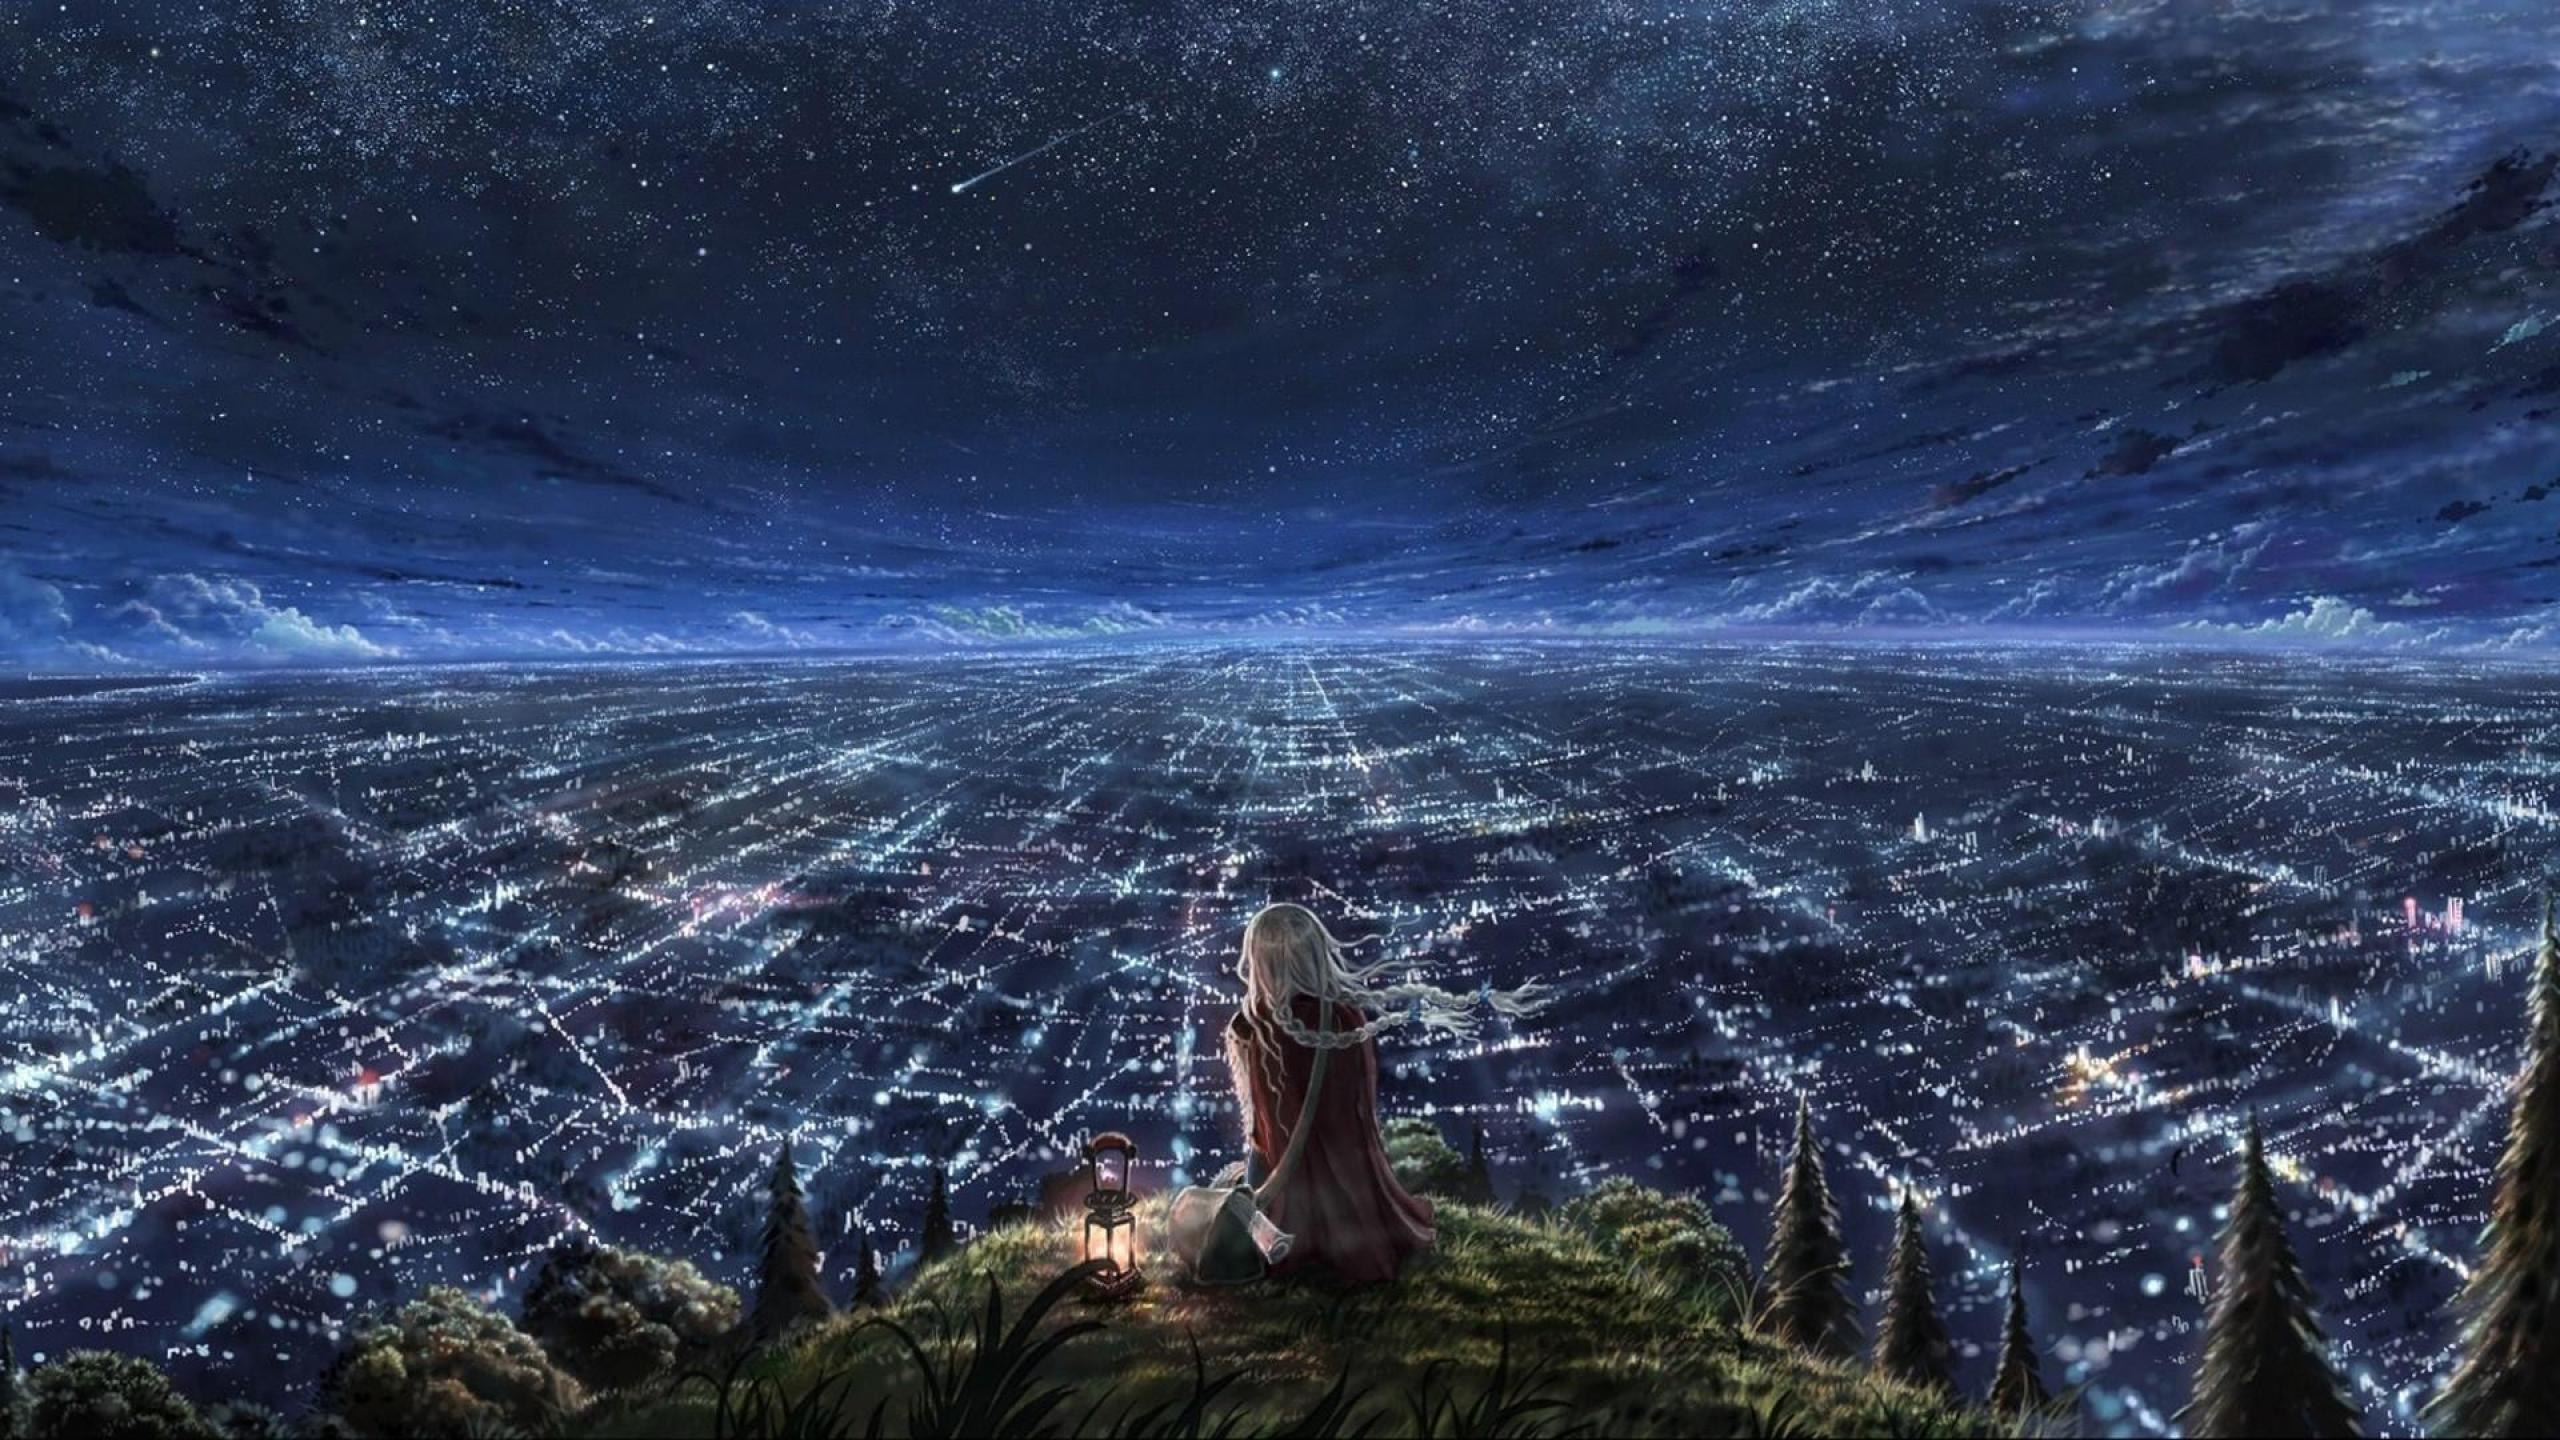 Starry night Women Animation HD Wallpapers, Desktop Backgrounds .